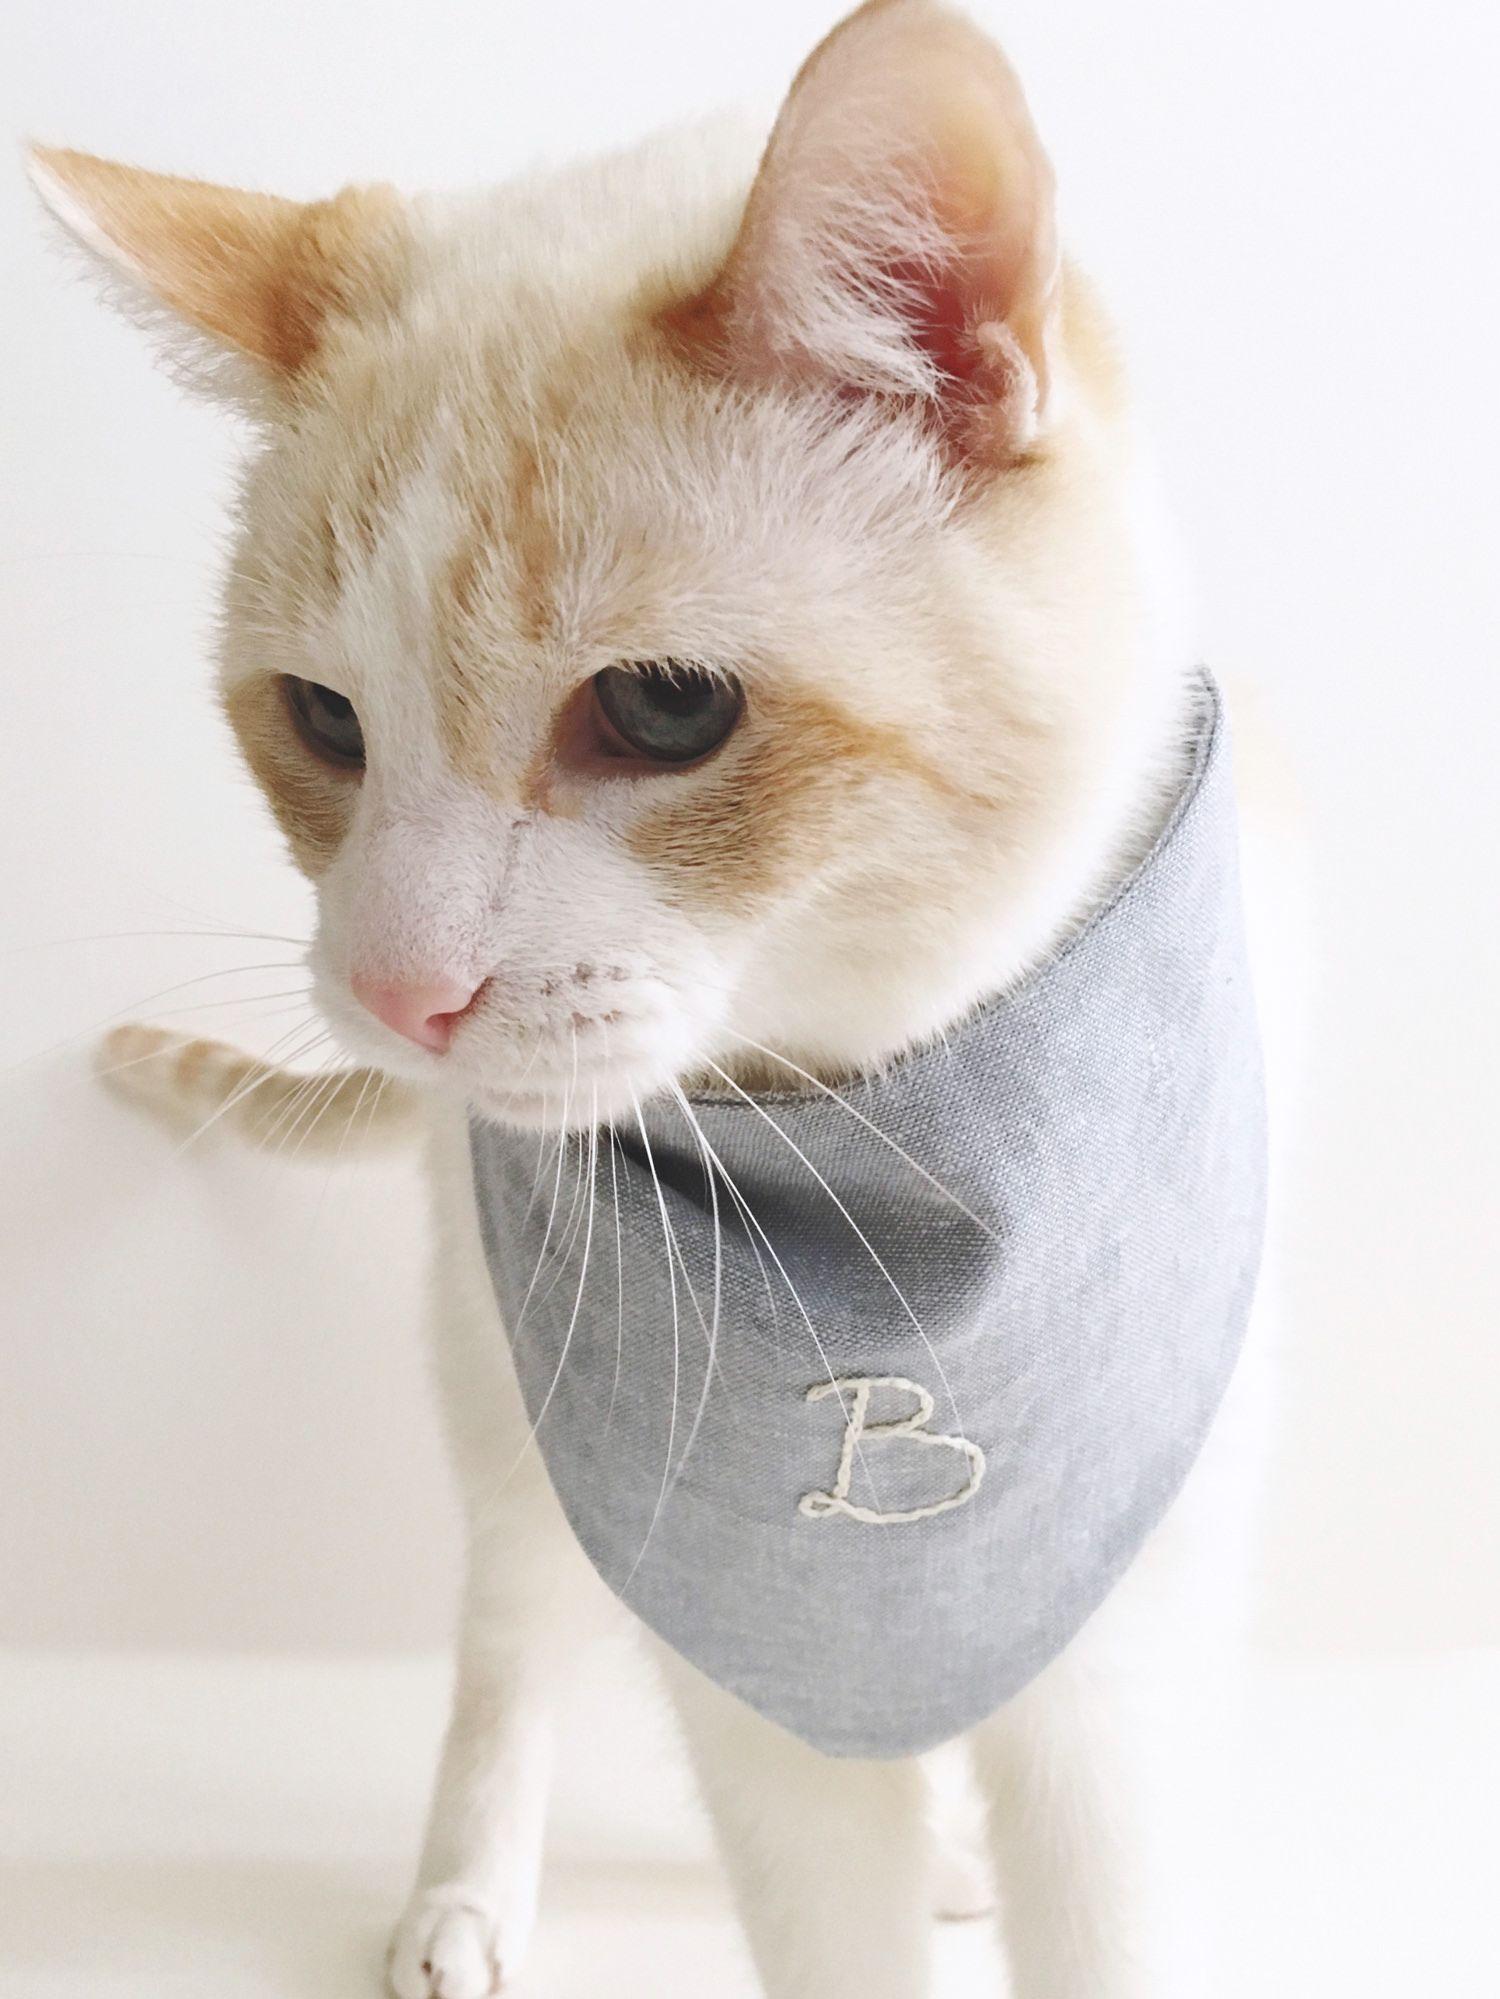 Diy Bandana For Your Cat Siamese Social Club Cat Care Cat Diy Cats